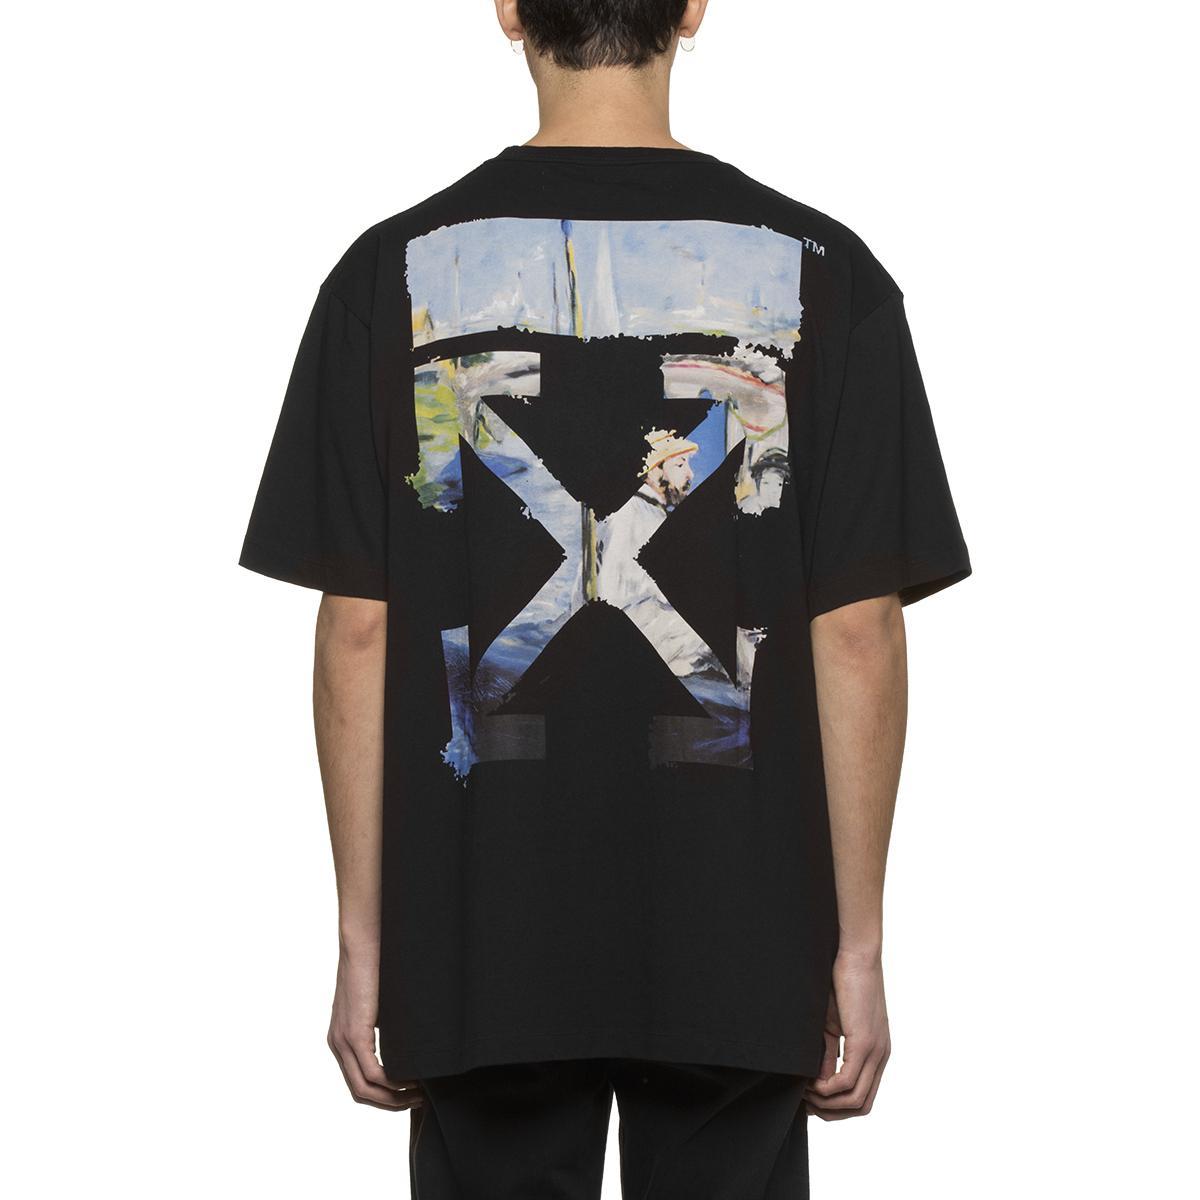 f74f44c8 Off-White c/o Virgil Abloh Colored Arrows T-shirt in Black for Men ...